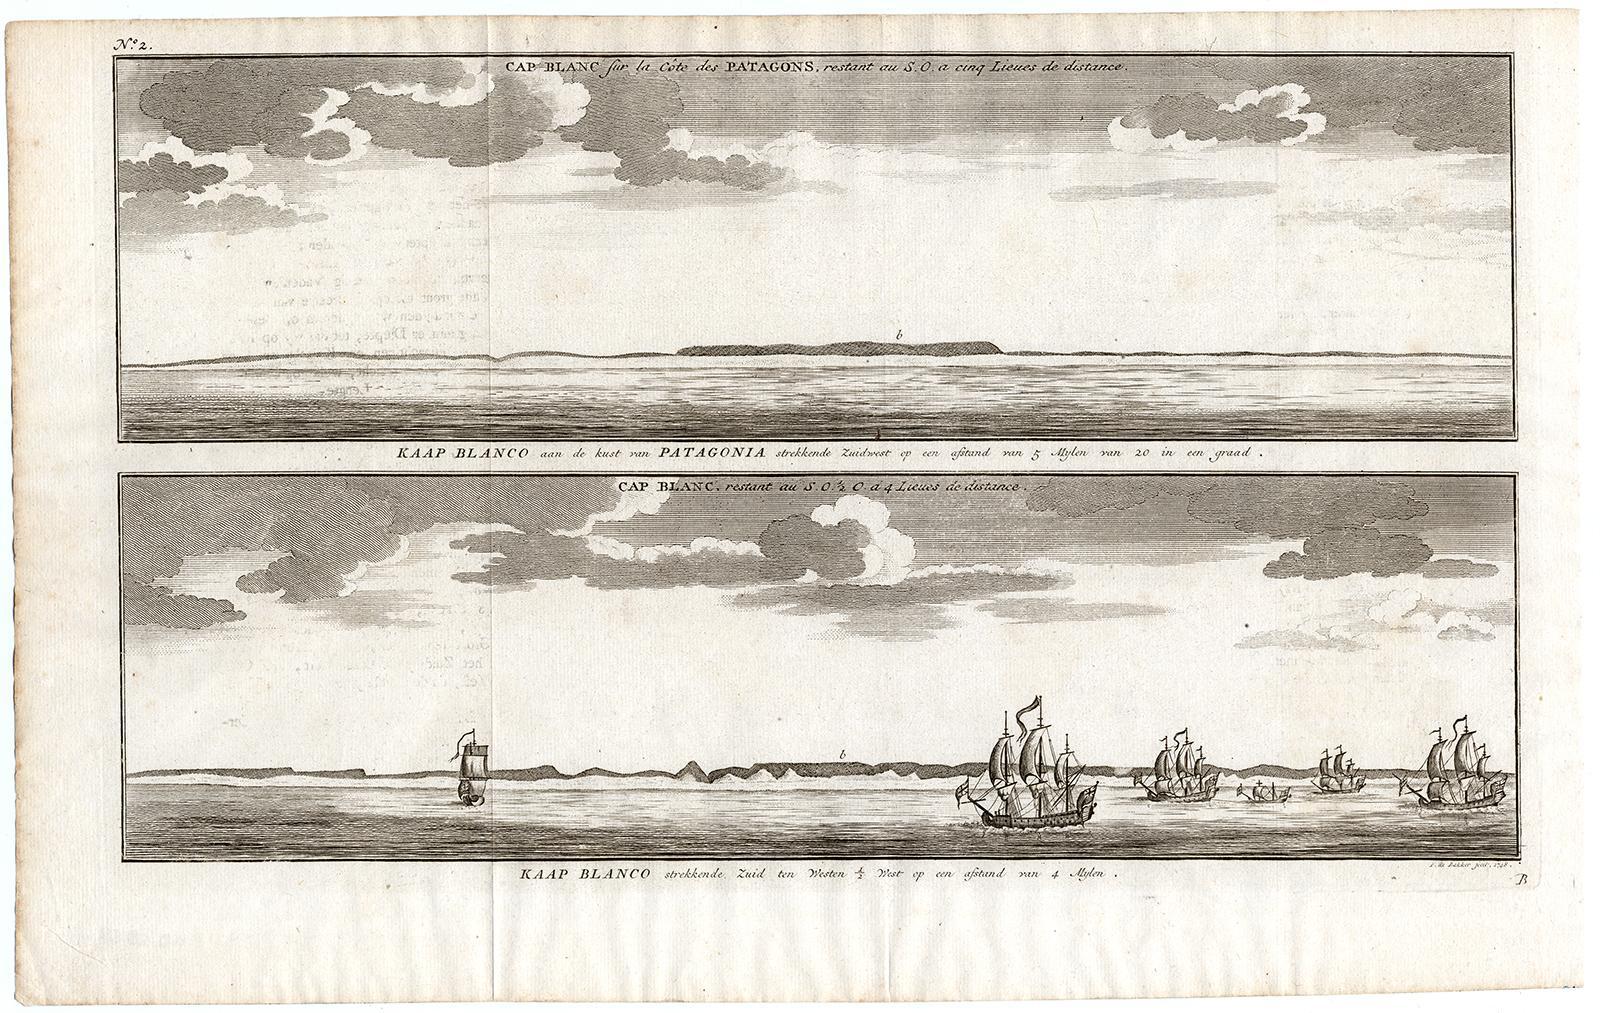 Antique Print-COASTAL VIEWS-CABO BLANCO-CAPE-PATAGONIA-ARGENTINA-Anson